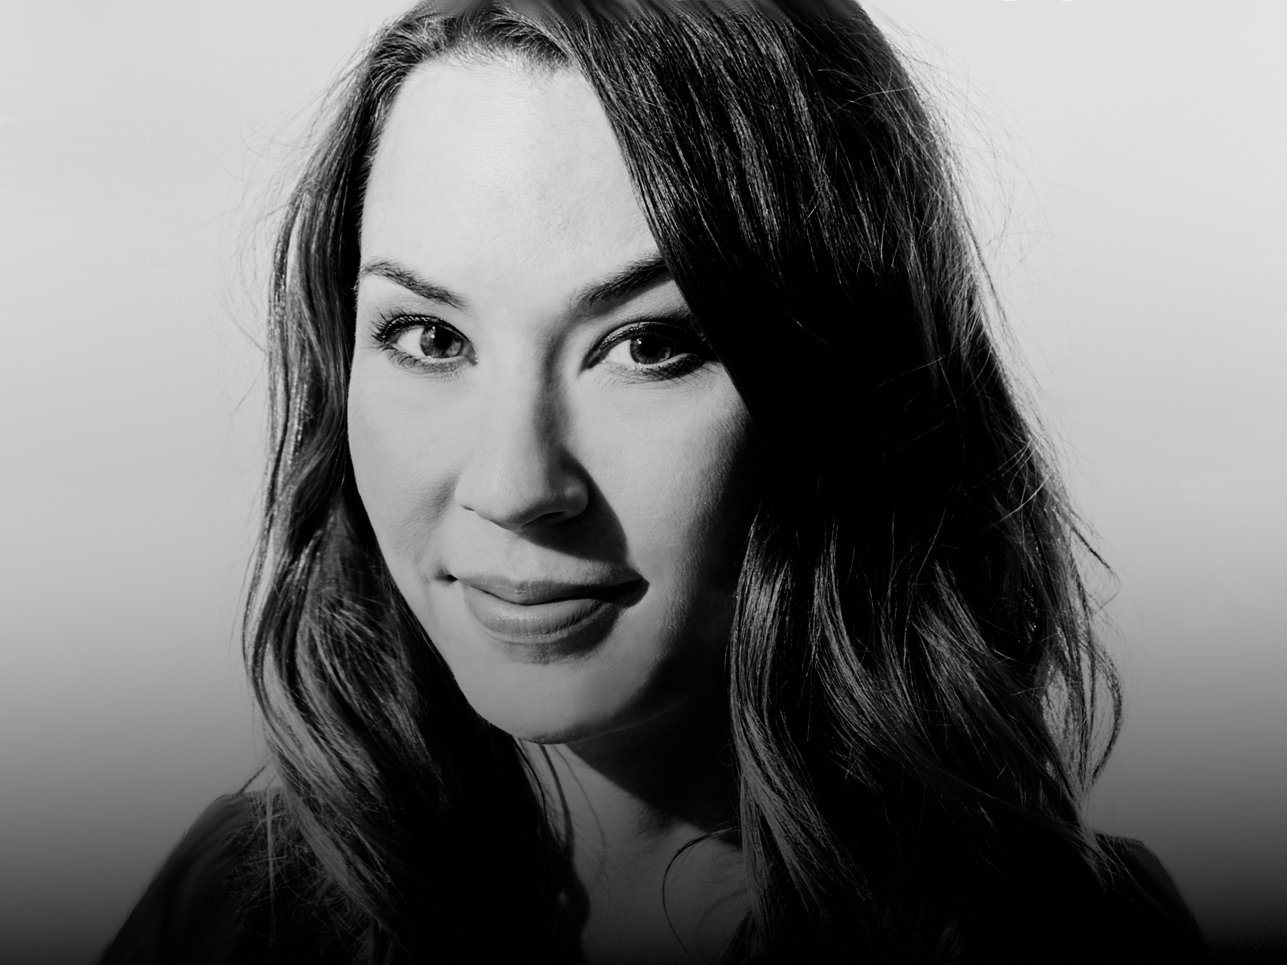 Image of Meredith Reeves